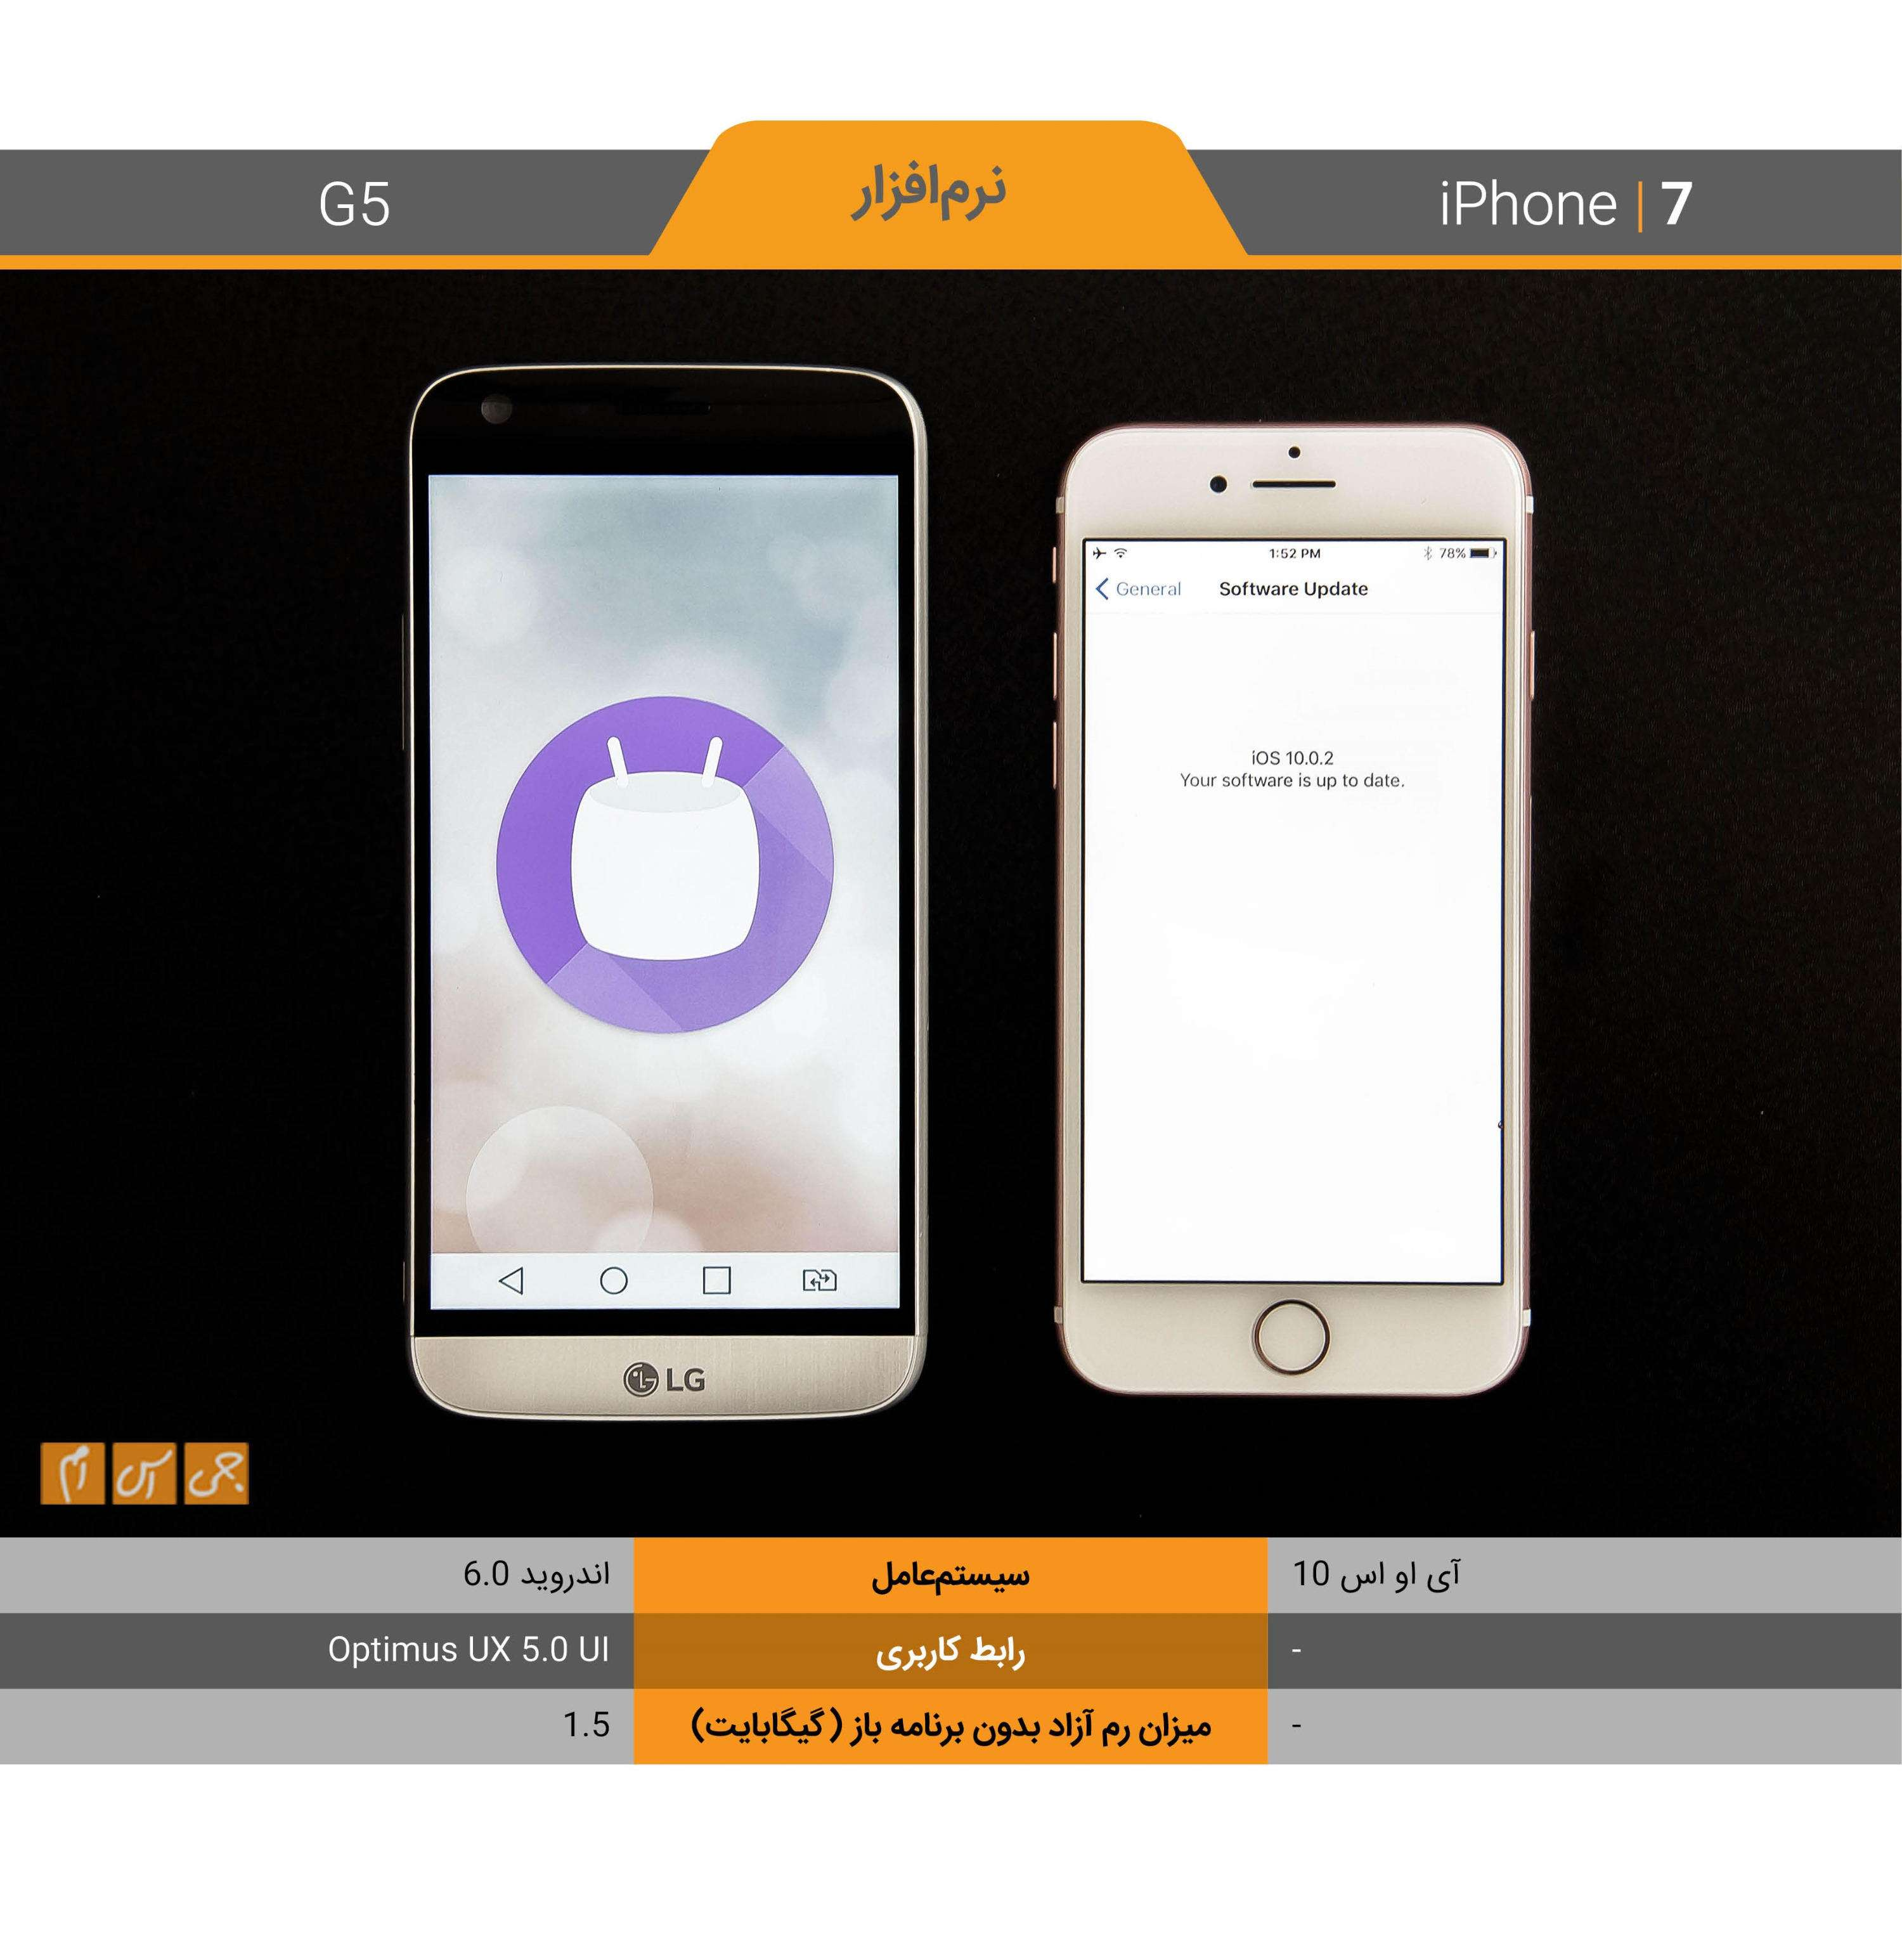 مقایسه G5 با iPhone 7 (جی5 و آیفون 7)